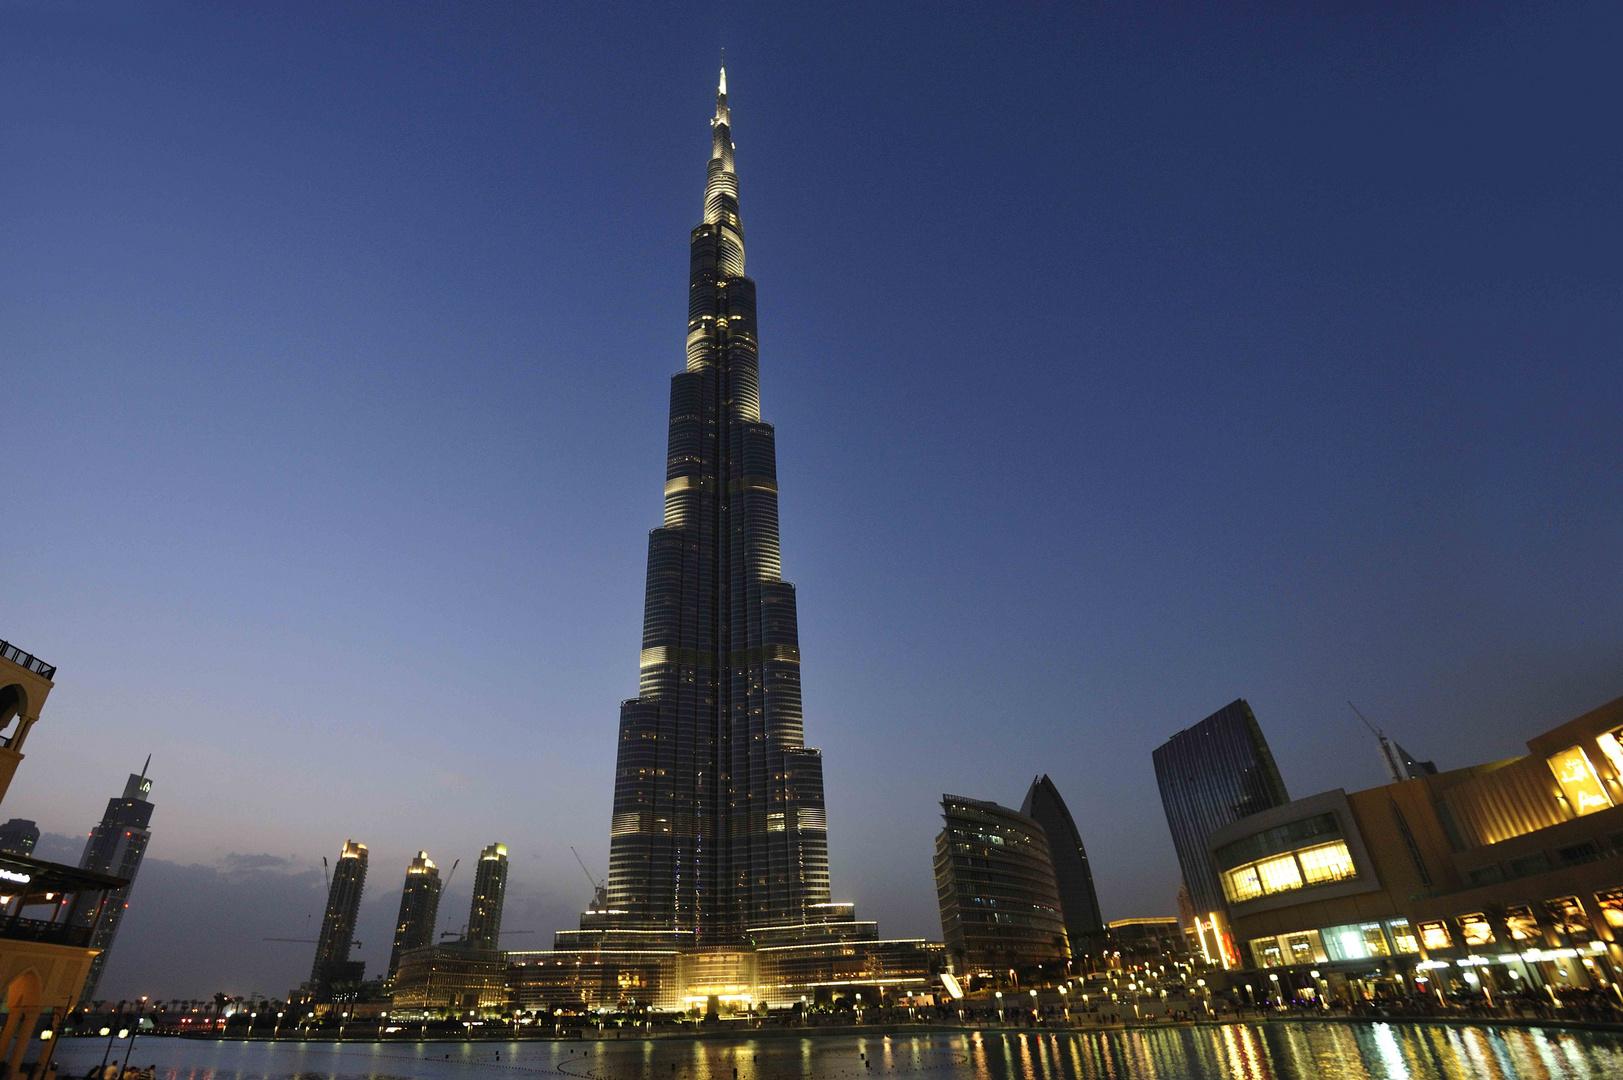 burj khalifa das h chste haus der welt foto bild asia middle east united arab emirates. Black Bedroom Furniture Sets. Home Design Ideas